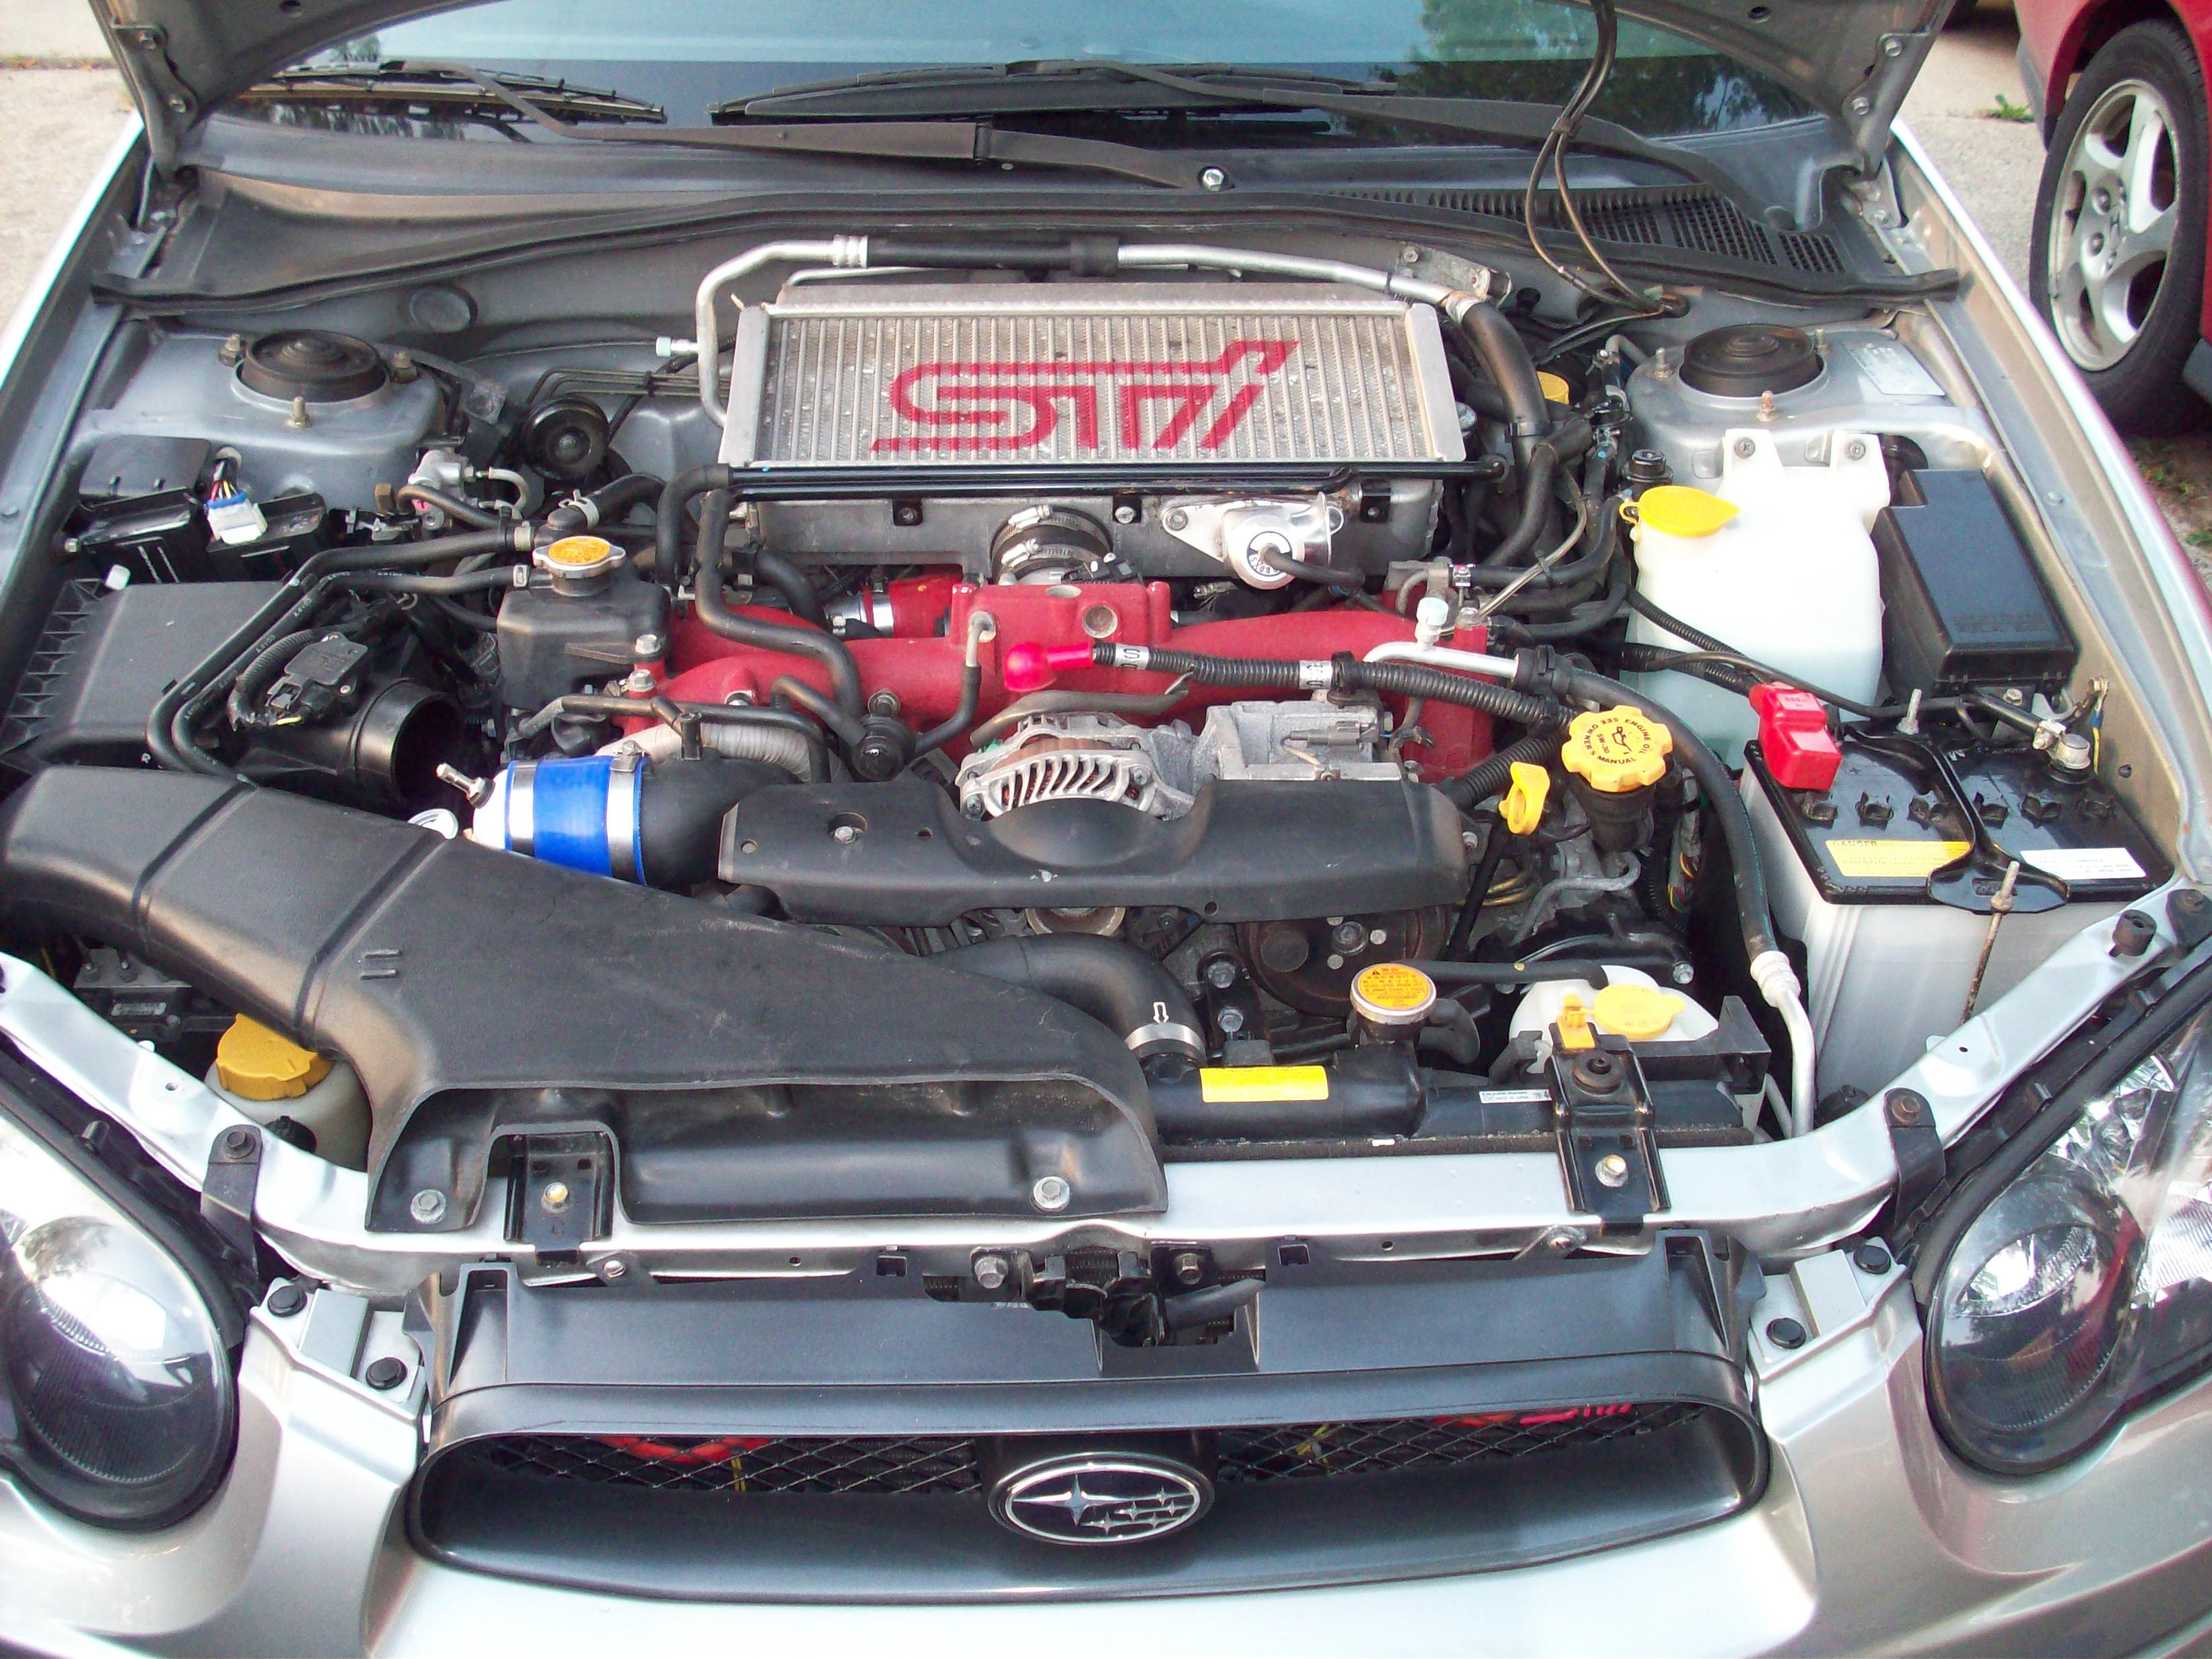 subaru1?t=1422674497 how to boostleak test a subaru Subaru Firing Order Diagram at n-0.co